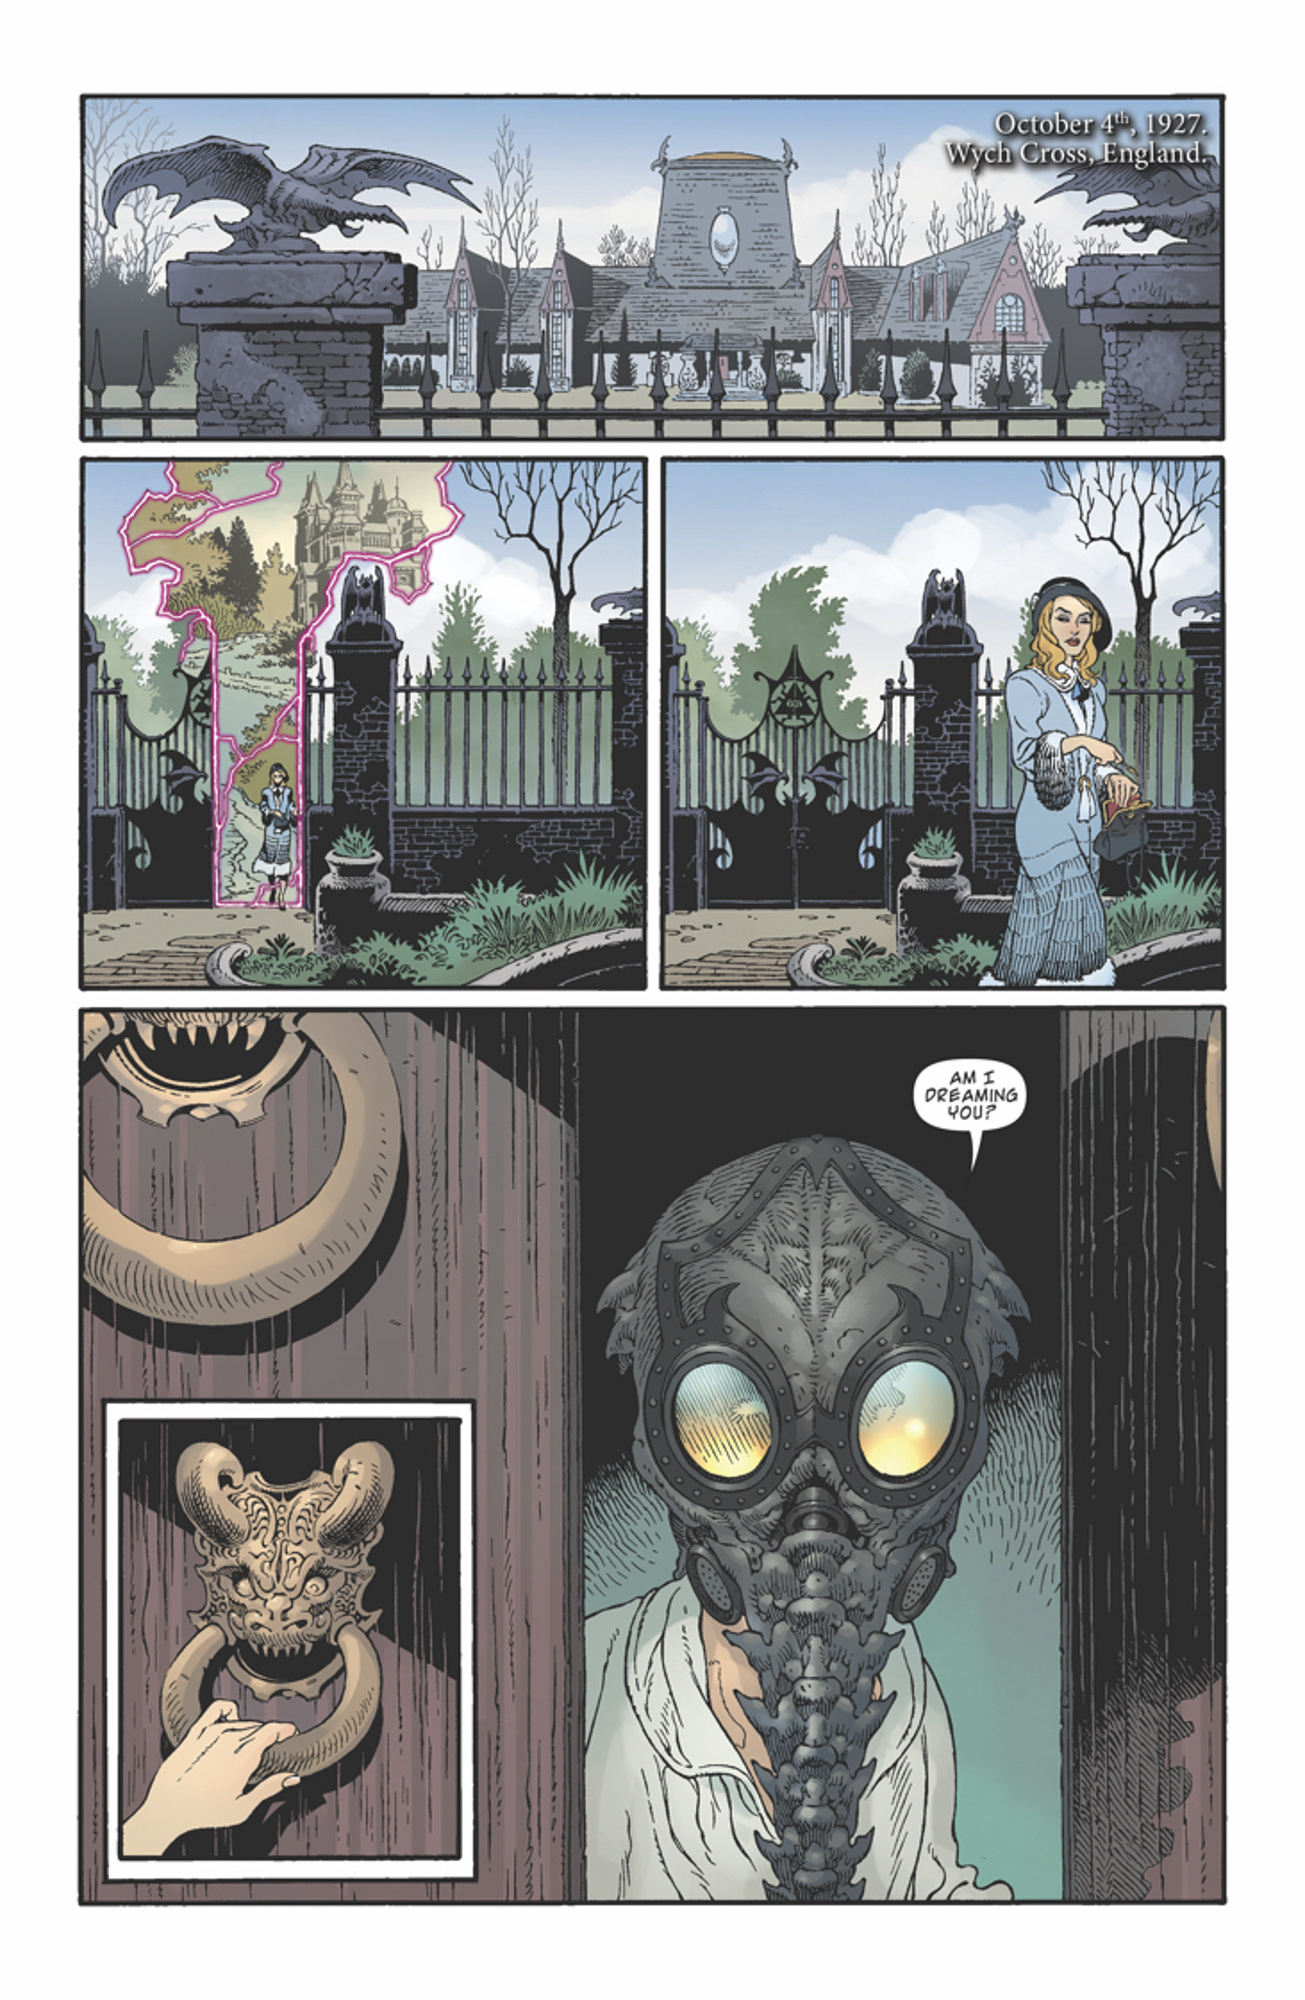 The Sandman/Locke and Key comic crossover